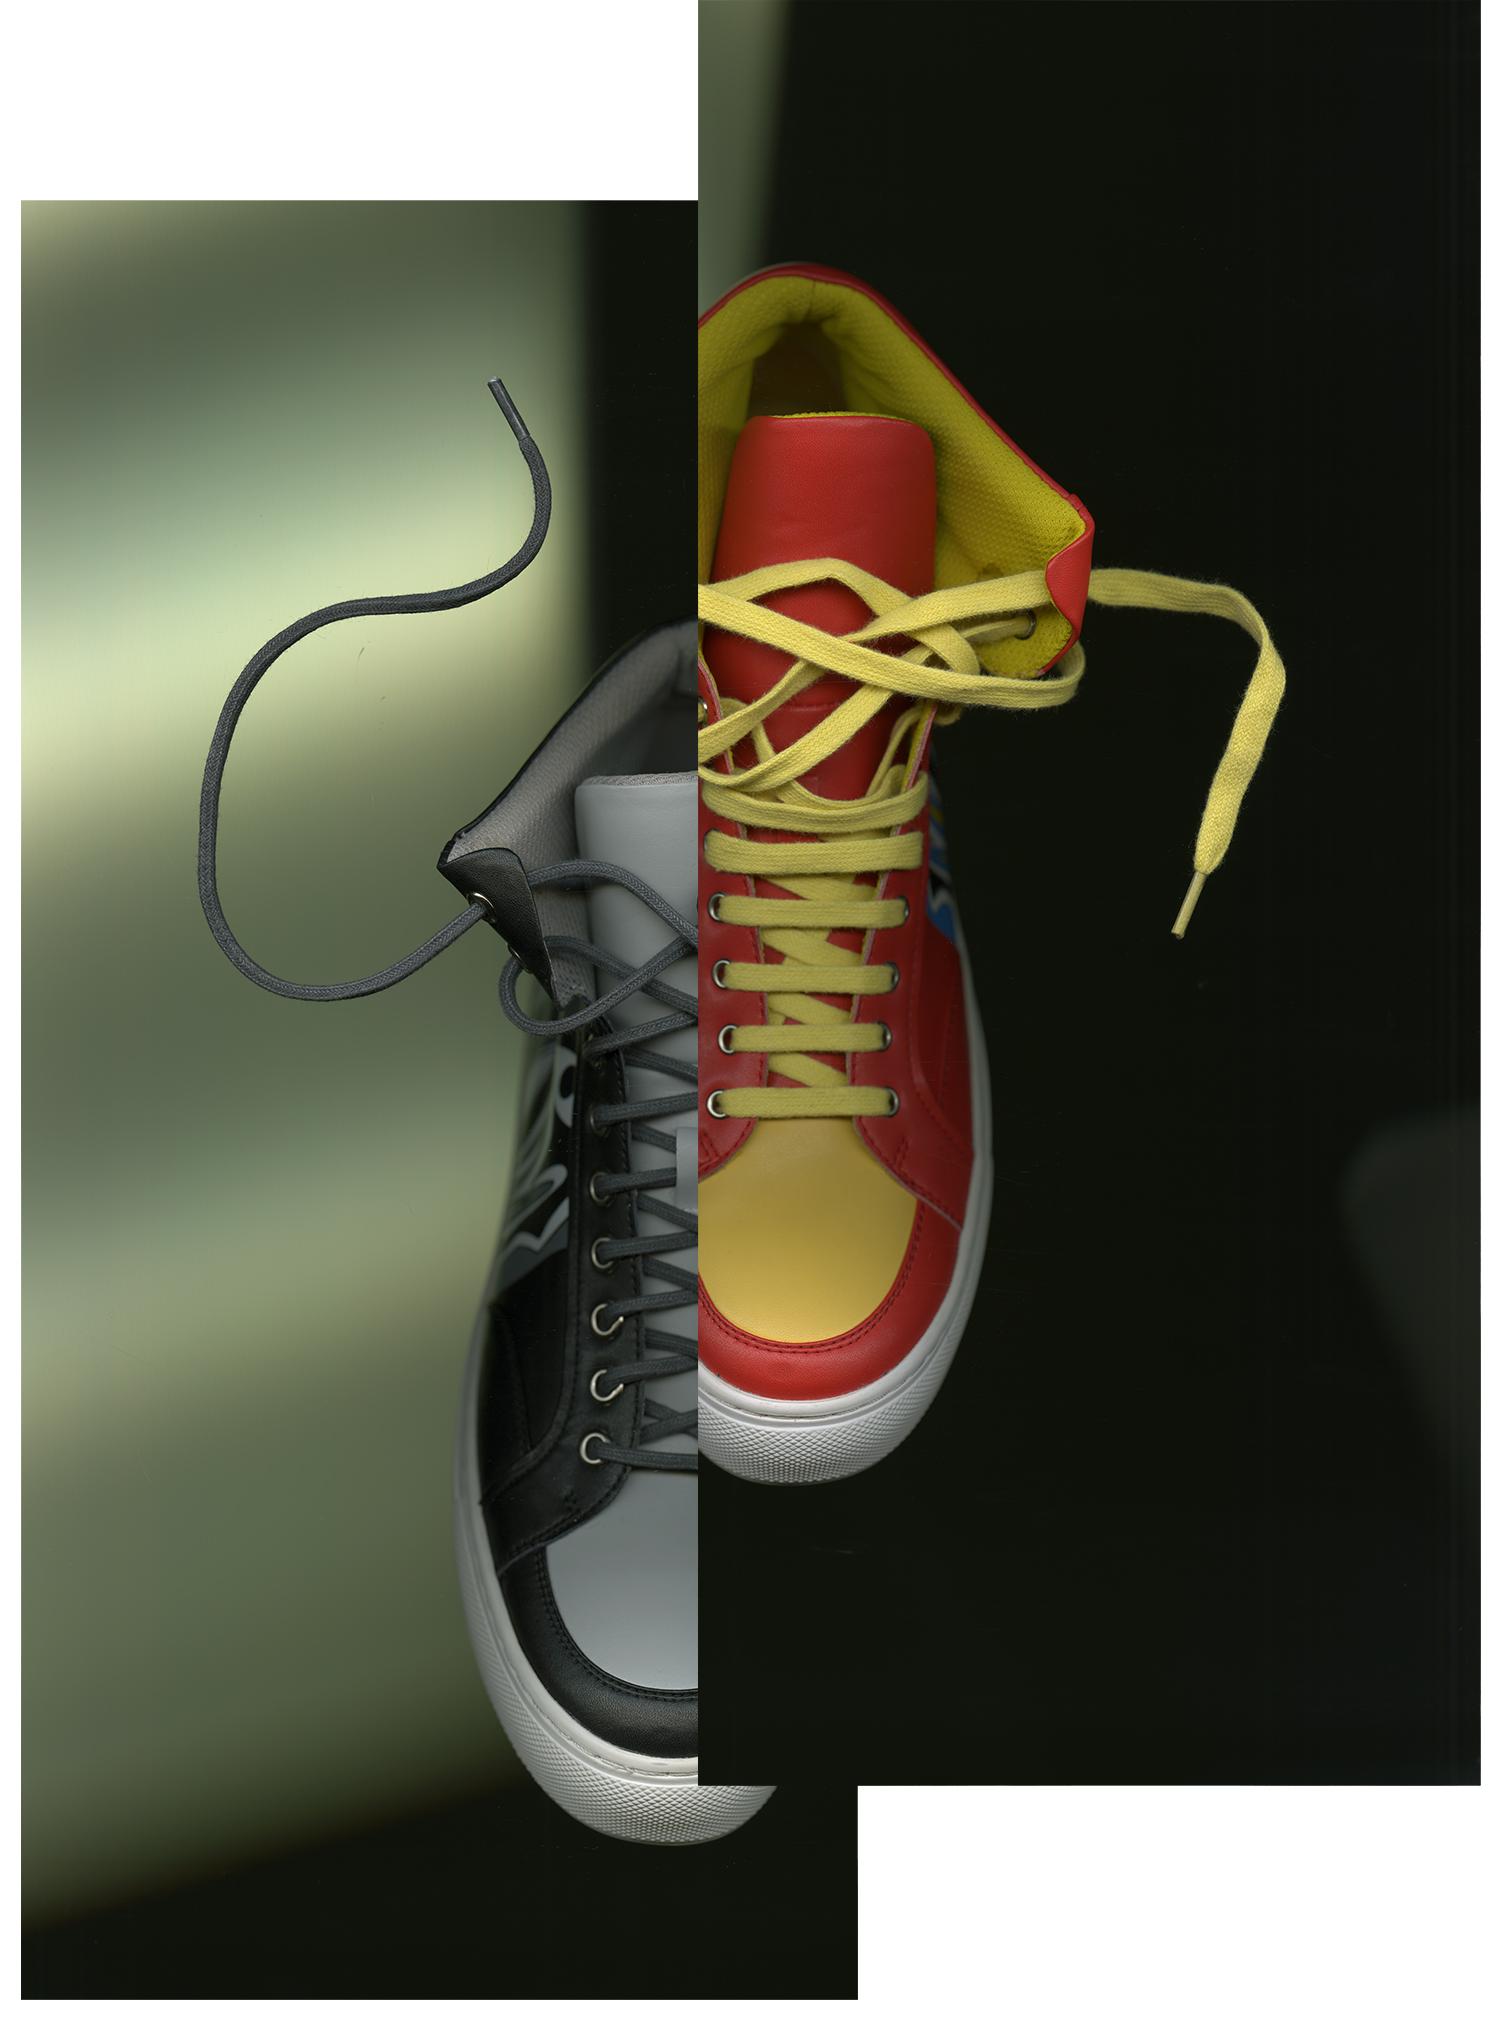 Shoes designed by Shih Kai Tai, MFA Fashion Merchandising.